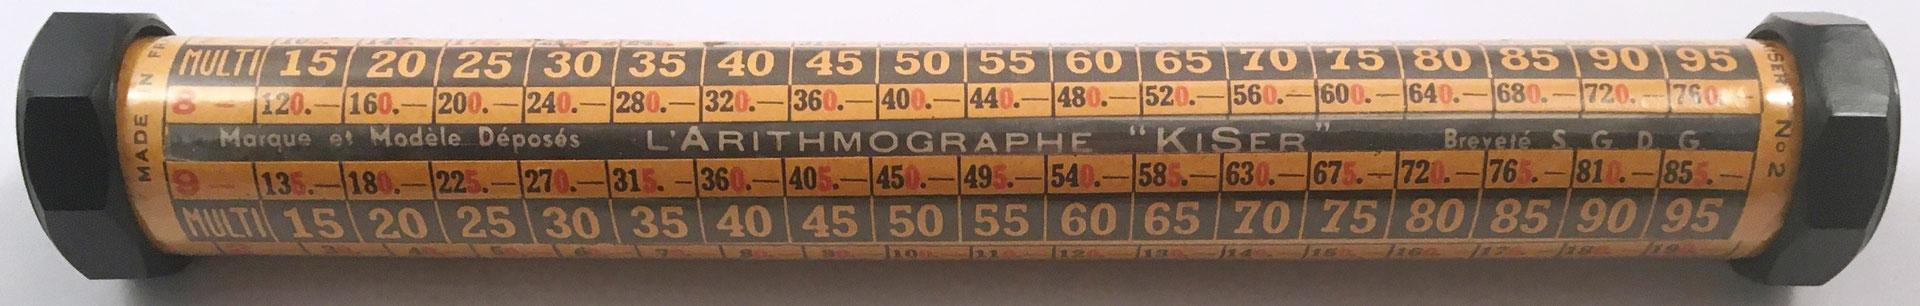 "L'Arithmographe ""KISER"" modelo nº 2, año 1920, 21 cm largo x 3 cm diámetro"